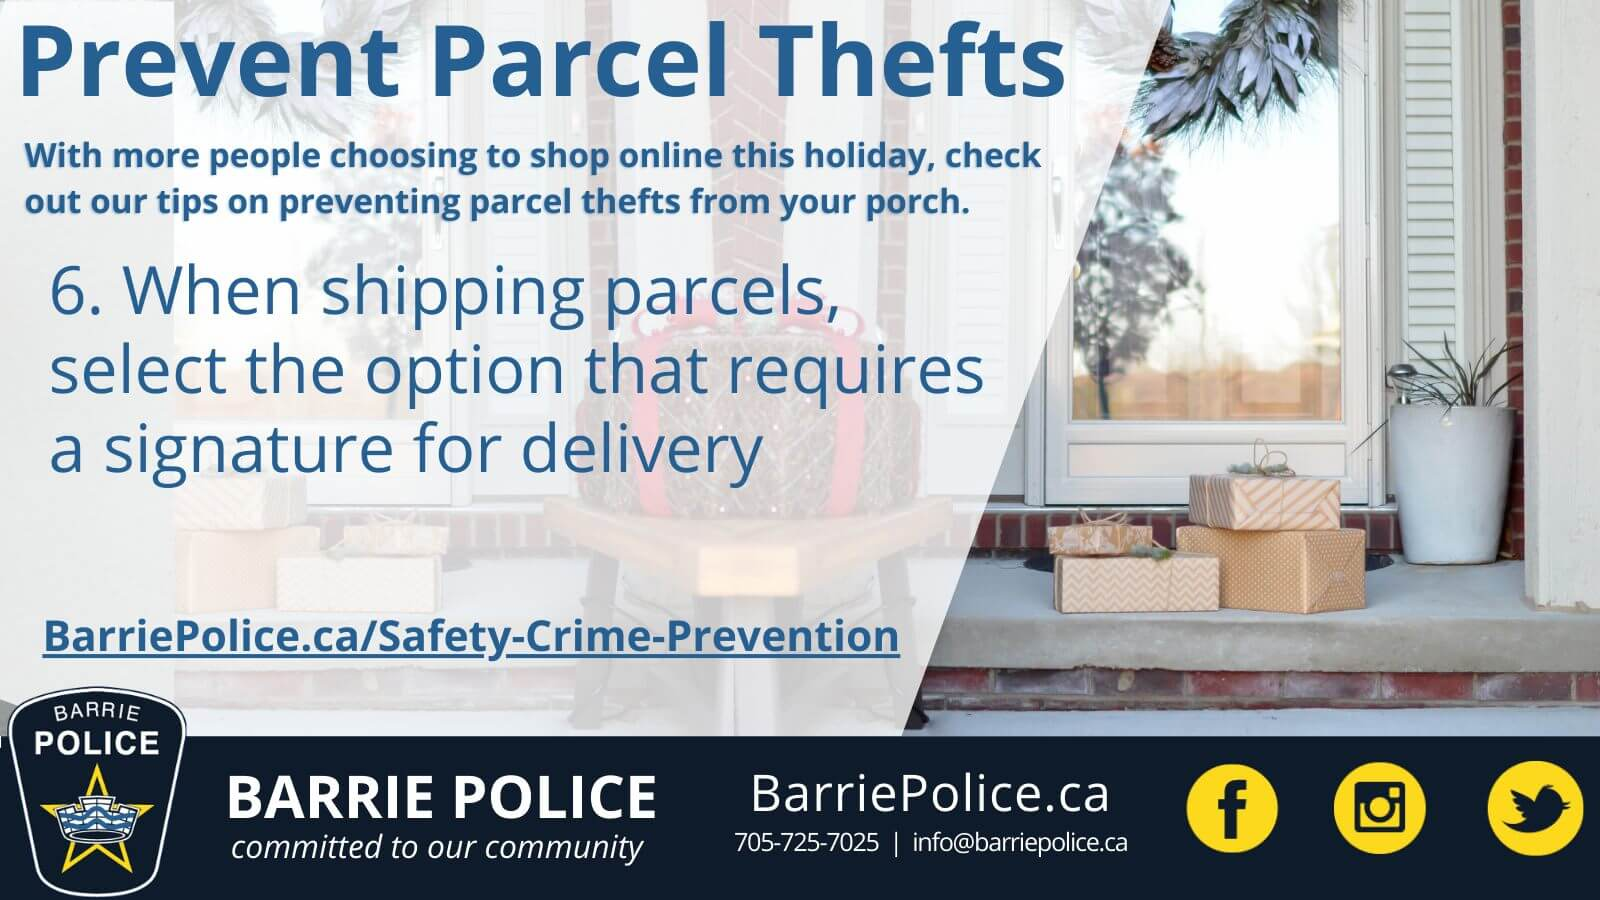 Prevent Parcel Thefts Tip 6: Request a signature on deliveries